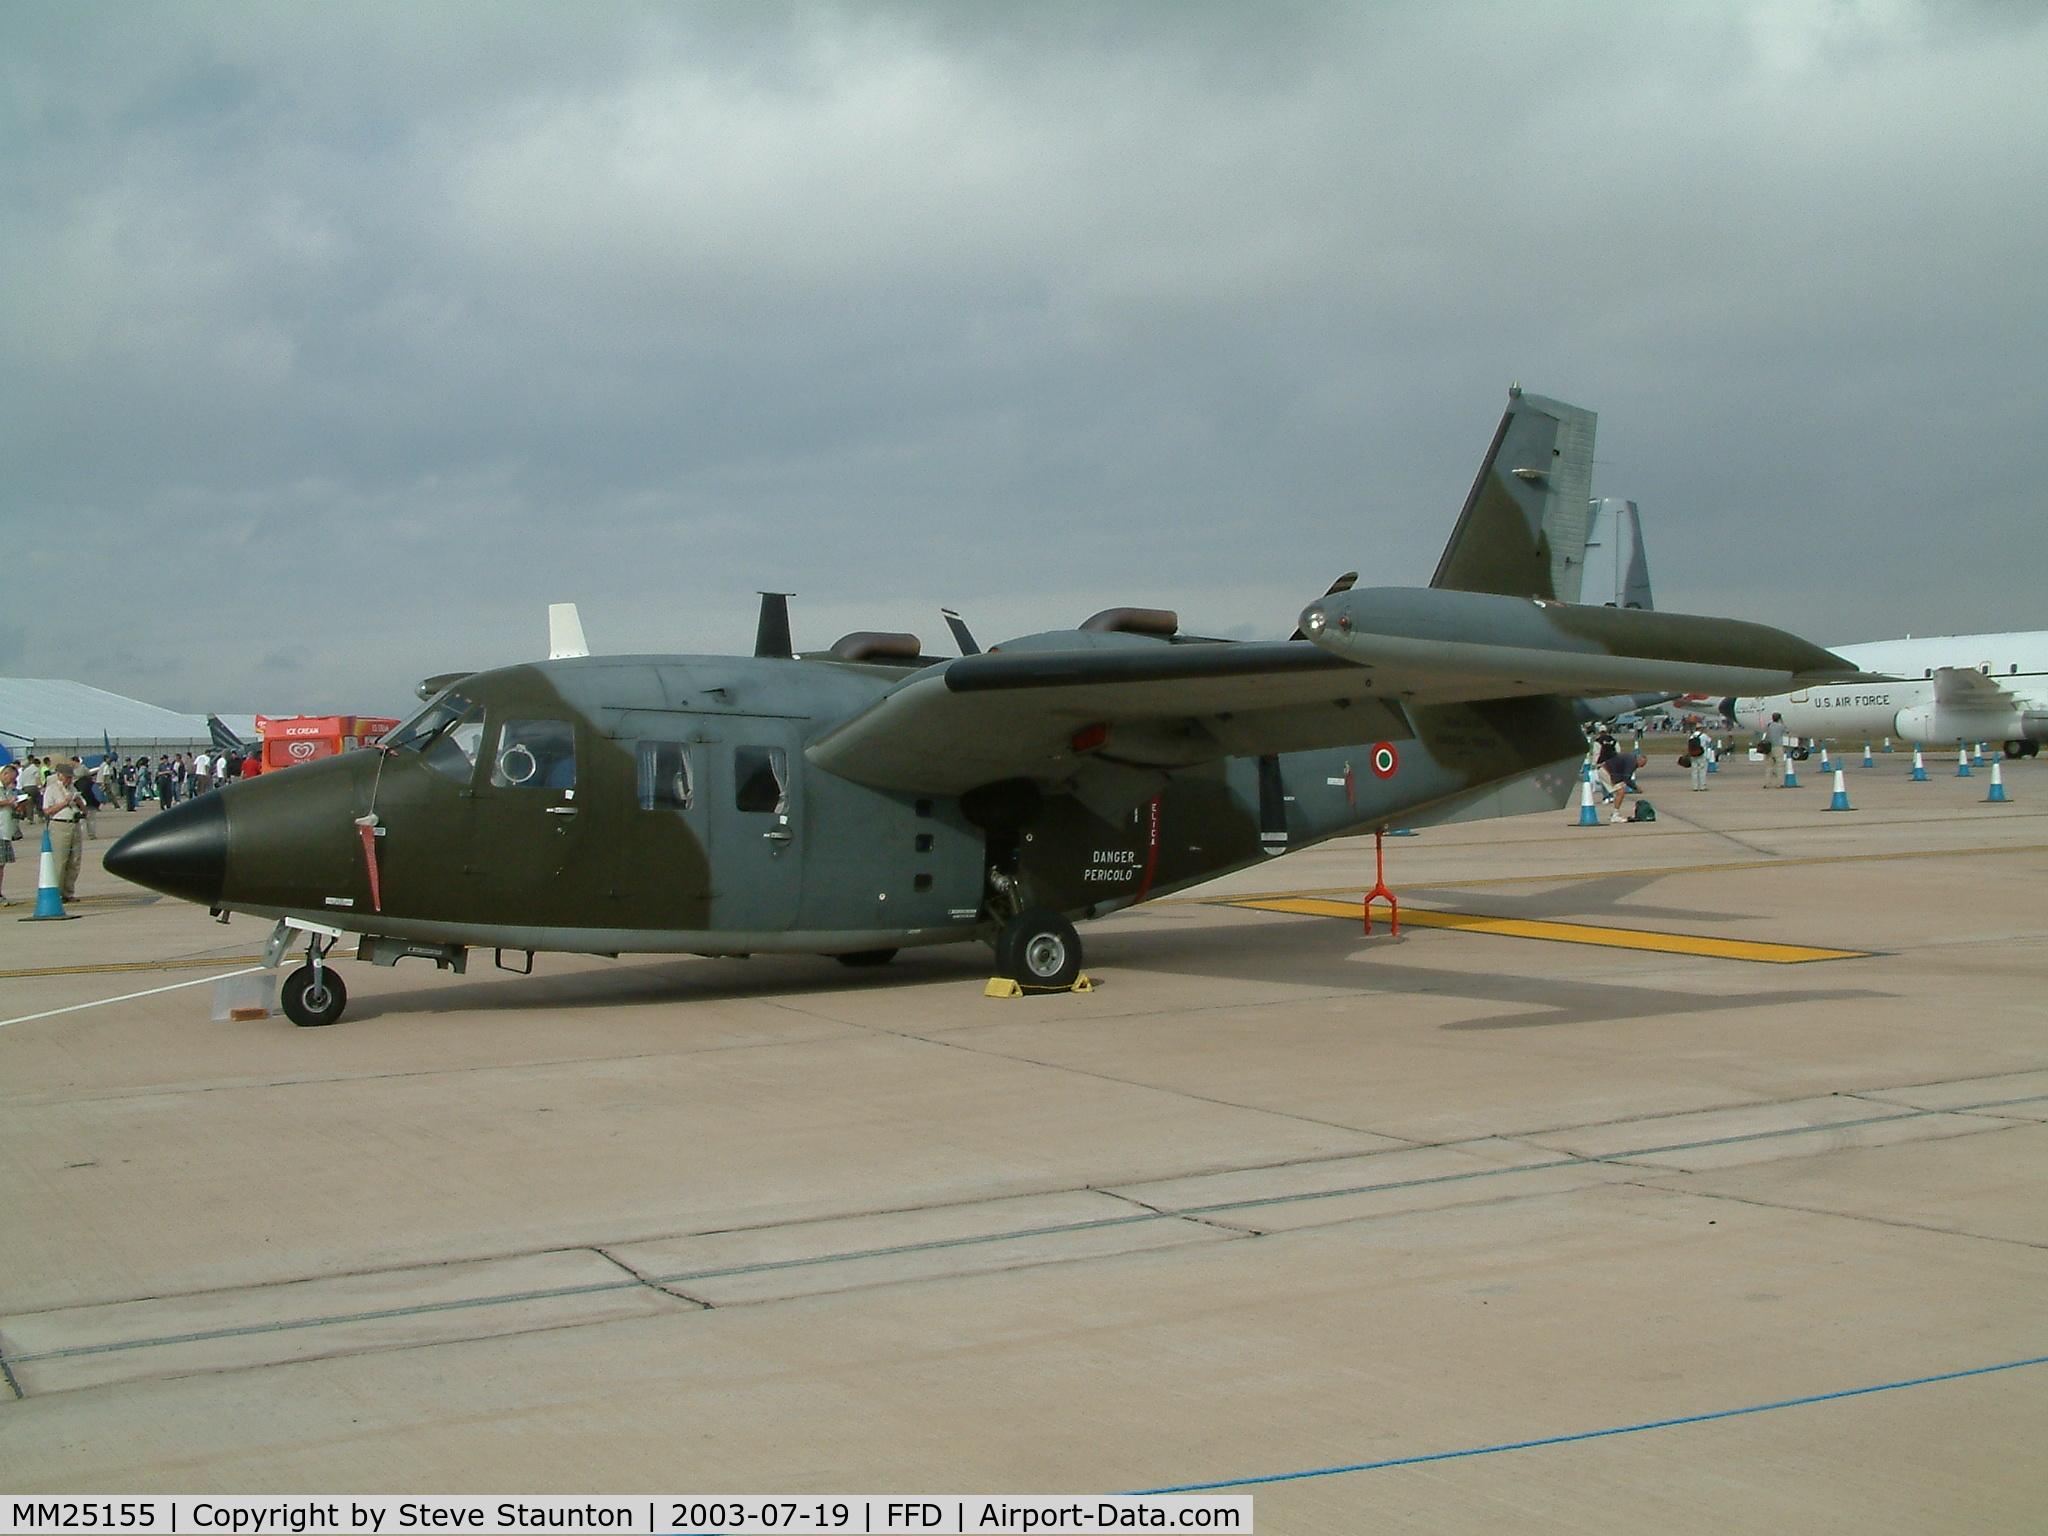 MM25155, Piaggio P-166DL-3 C/N 474, Royal International Air Tattoo 2003